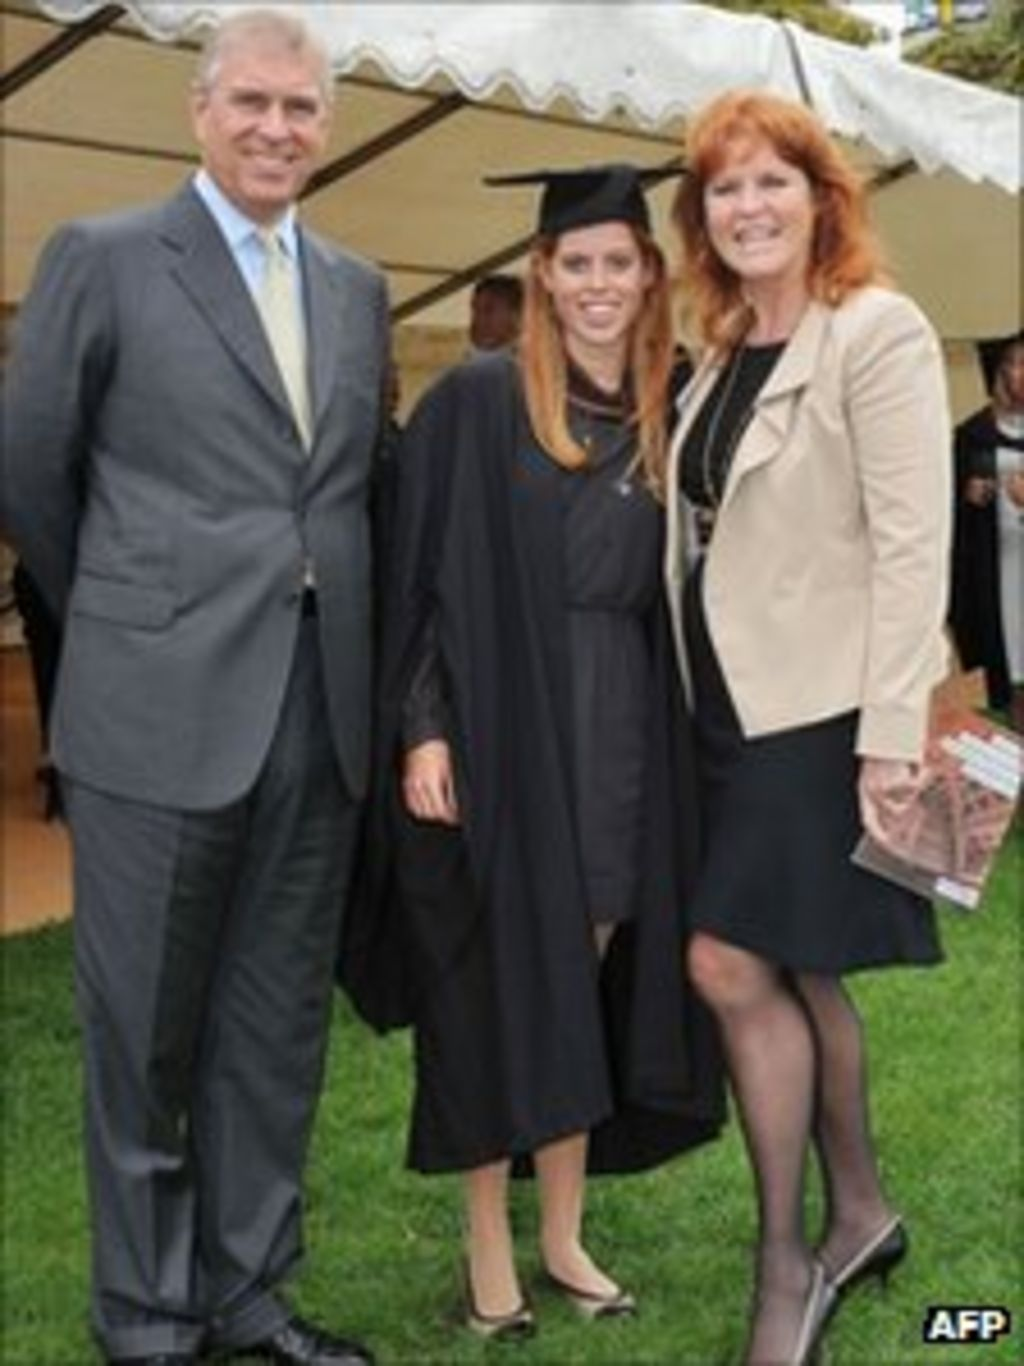 Princess Beatrice graduates from Goldsmiths College - BBC News